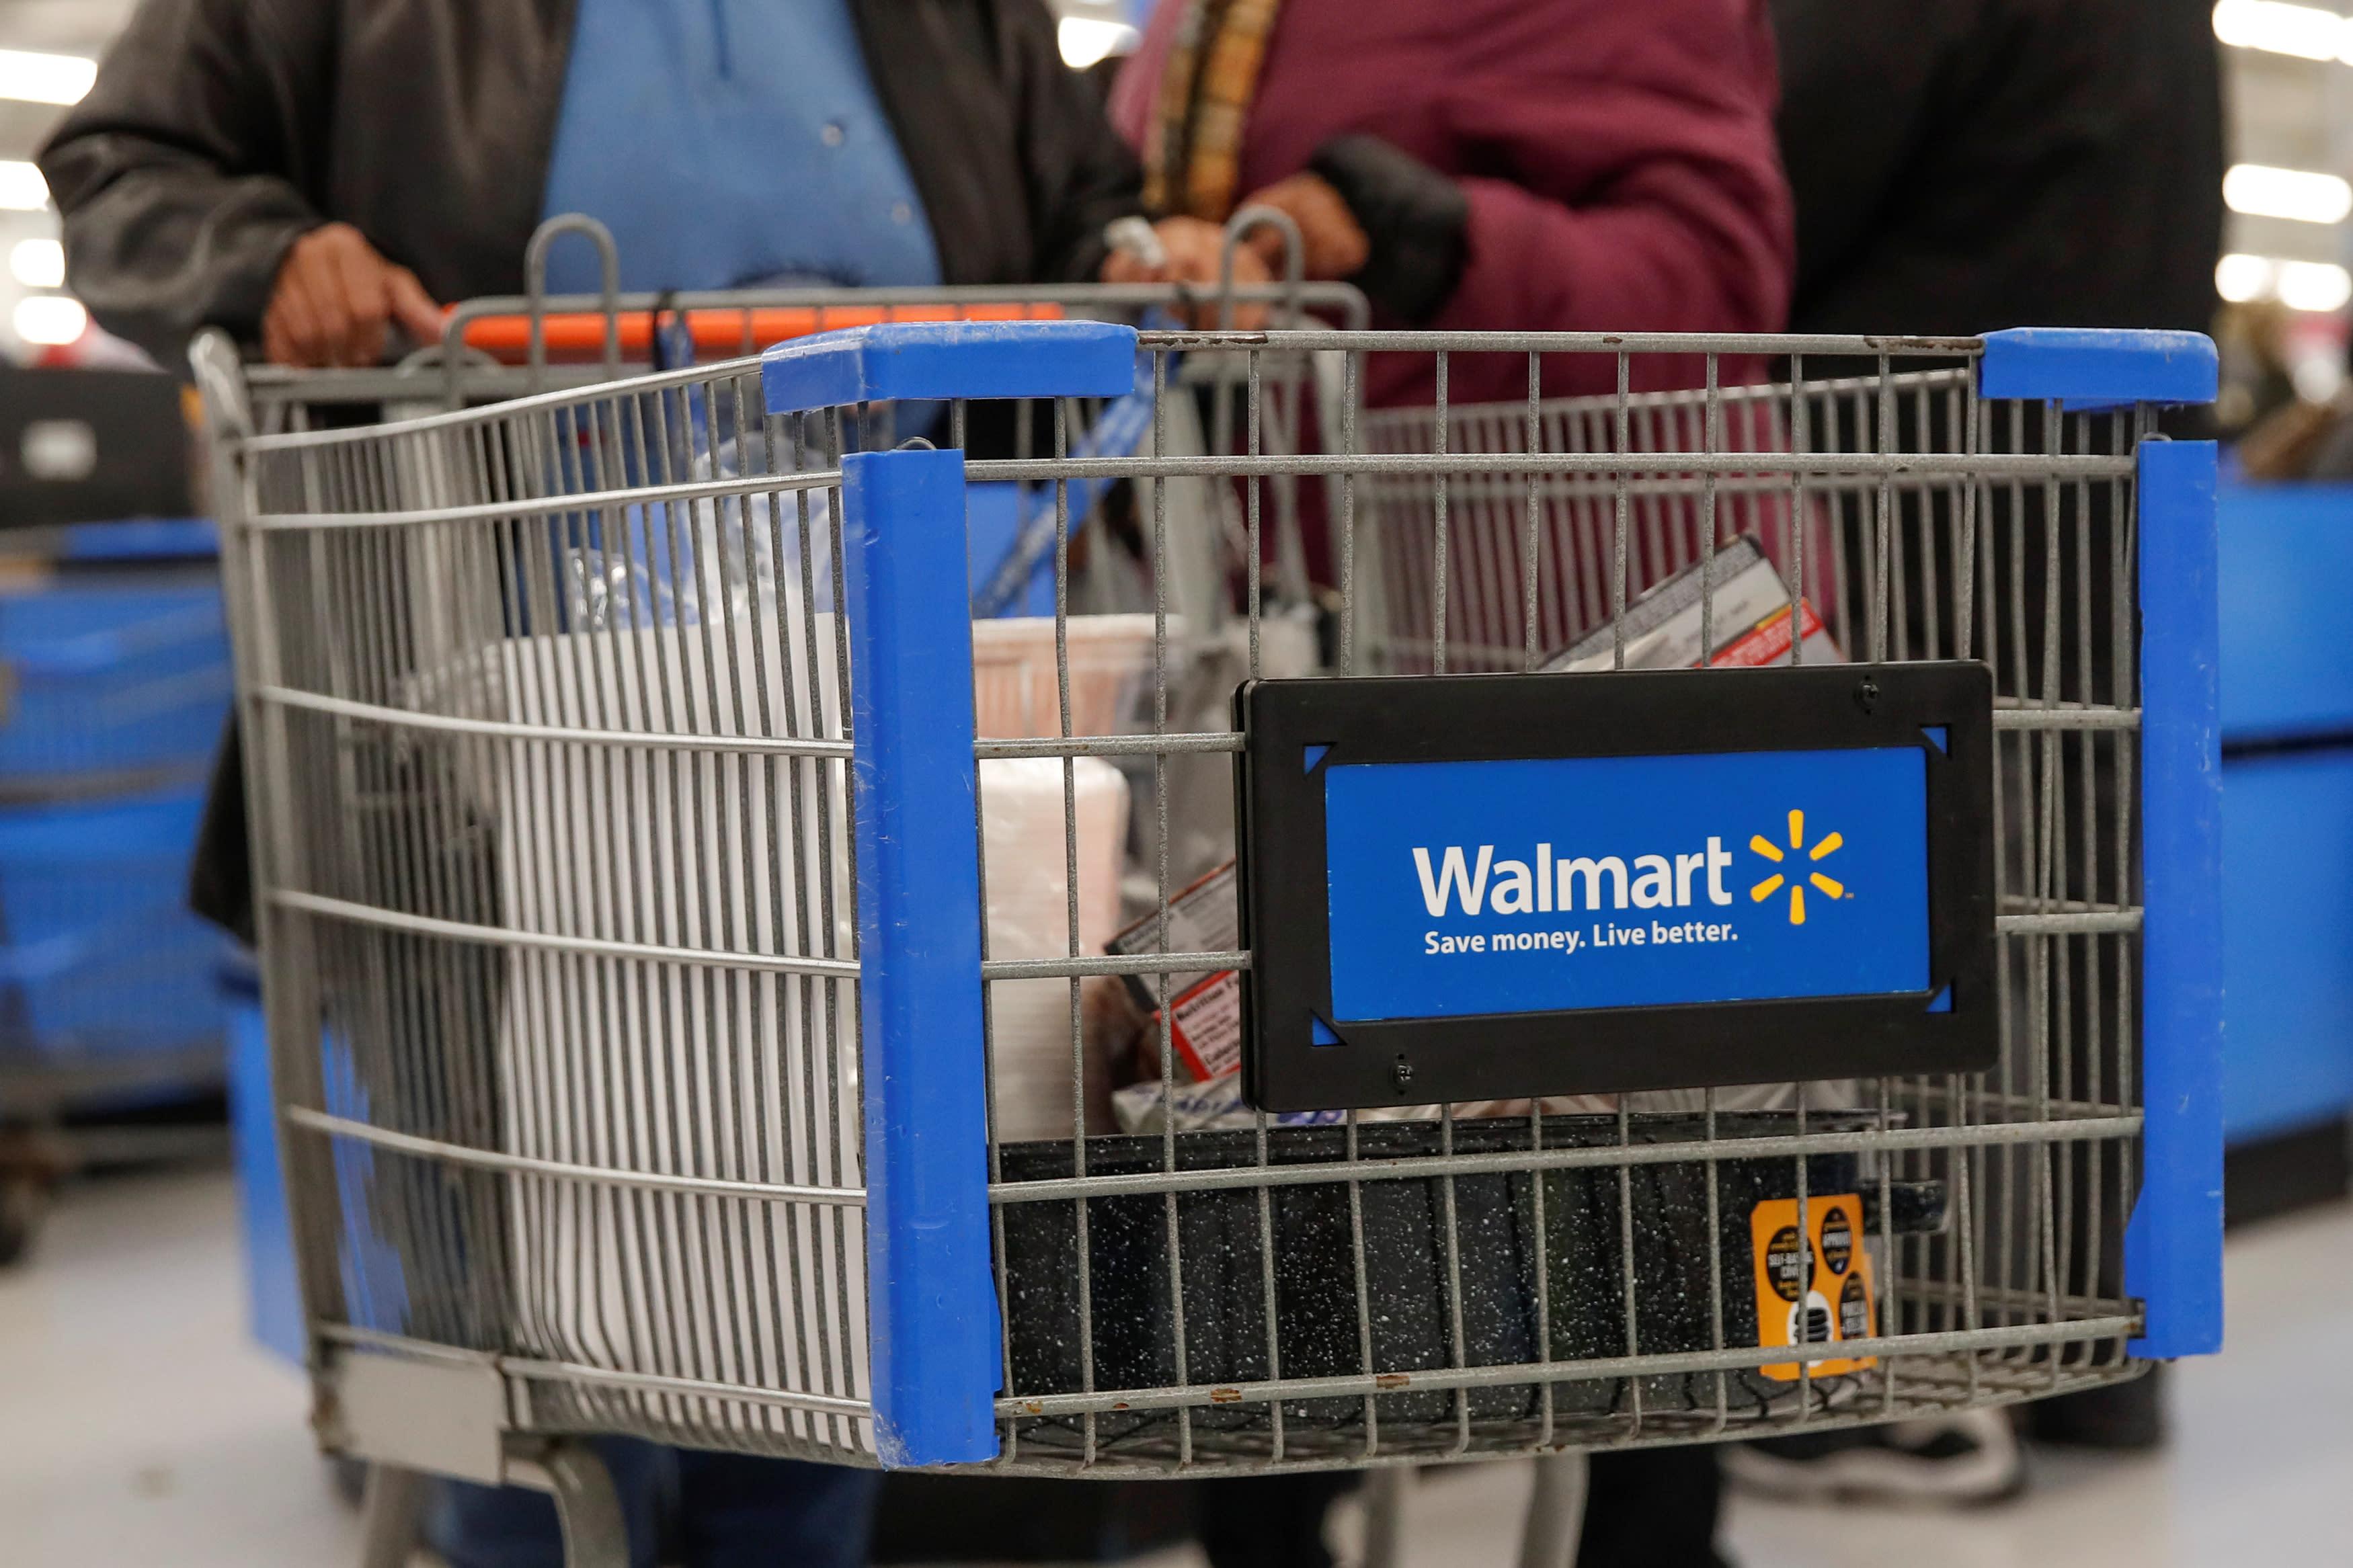 Walmart to hire 150,000 people amid coronavirus, to give $550 million in cash bonuses